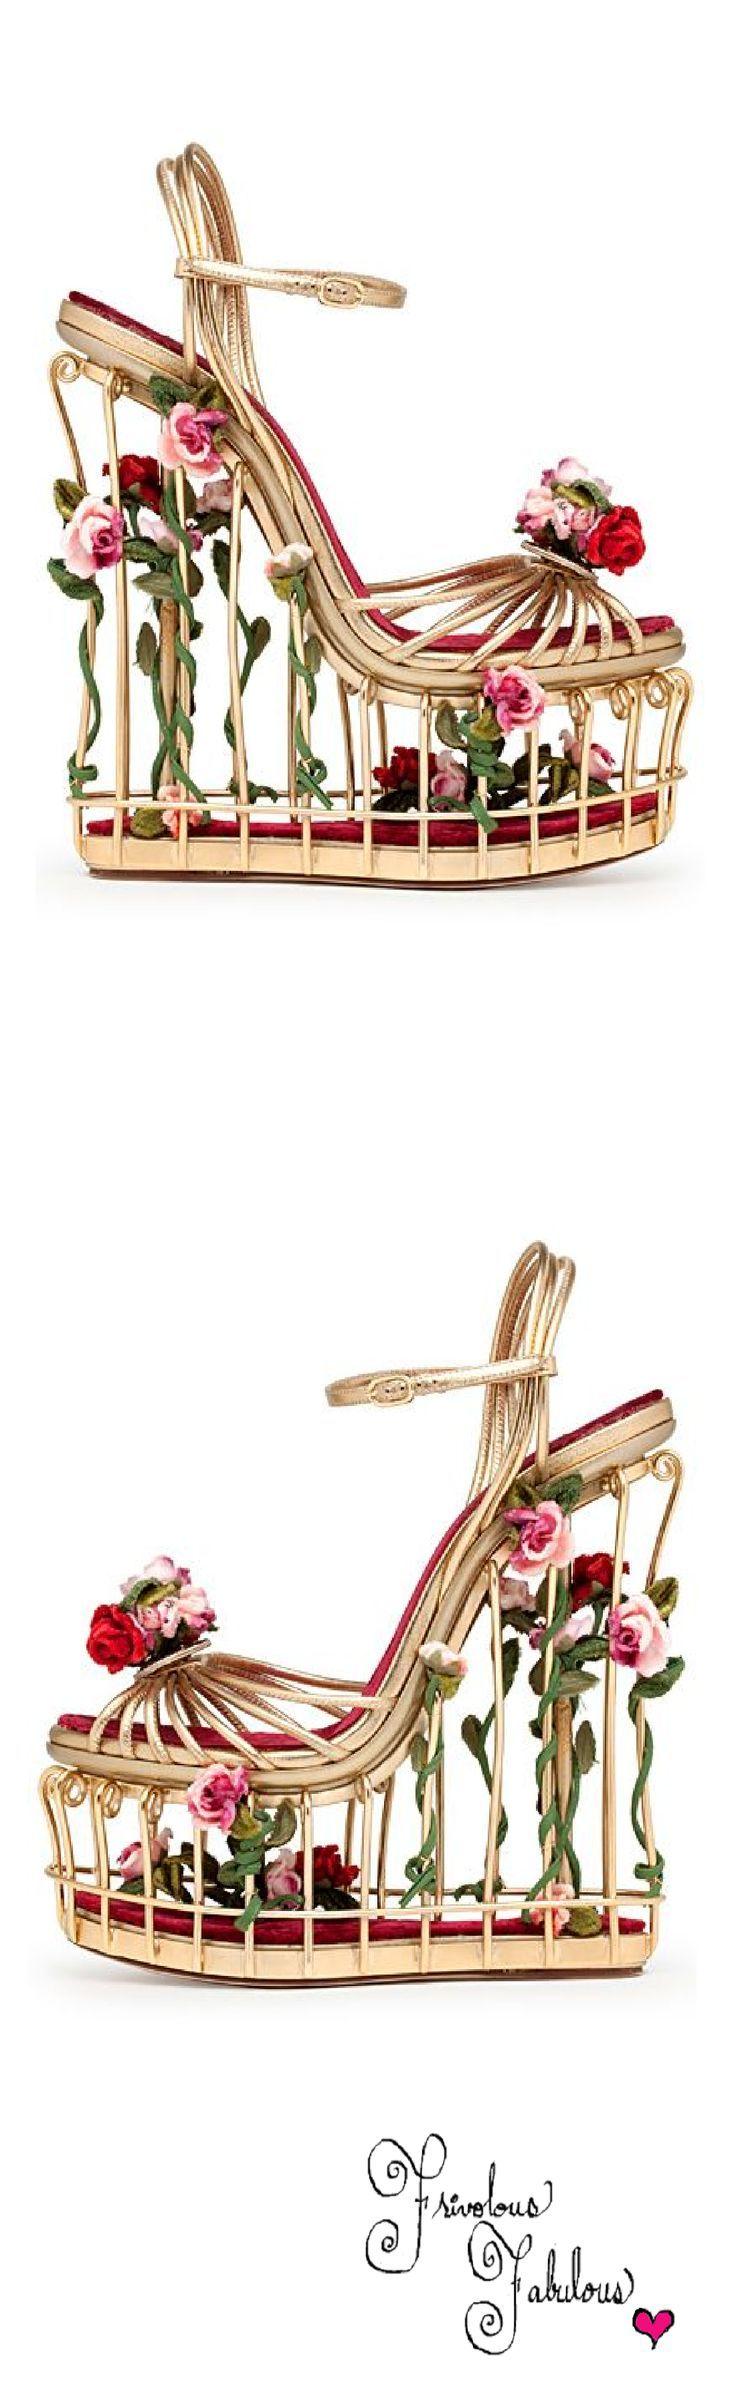 Frivolous Fabulous - Dolce & Gabbana Spring Summer 2013